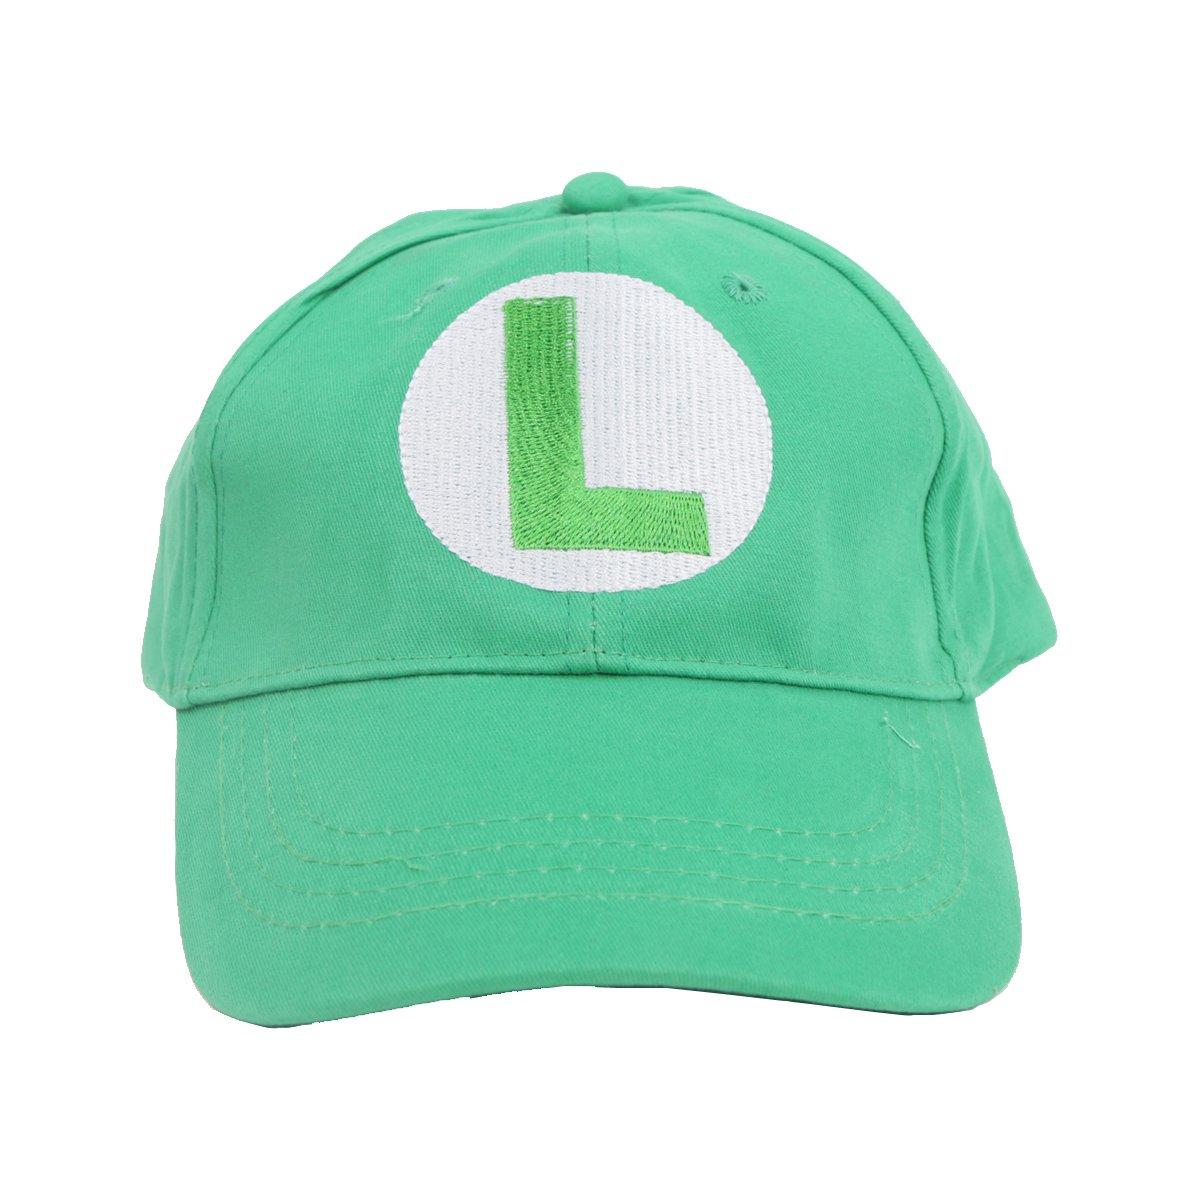 Rouge Mario Bros Chapeau Mario Luigi Baseball Cap Rouge Vert Hat Sports Cosplay Costume Porter Sportswear